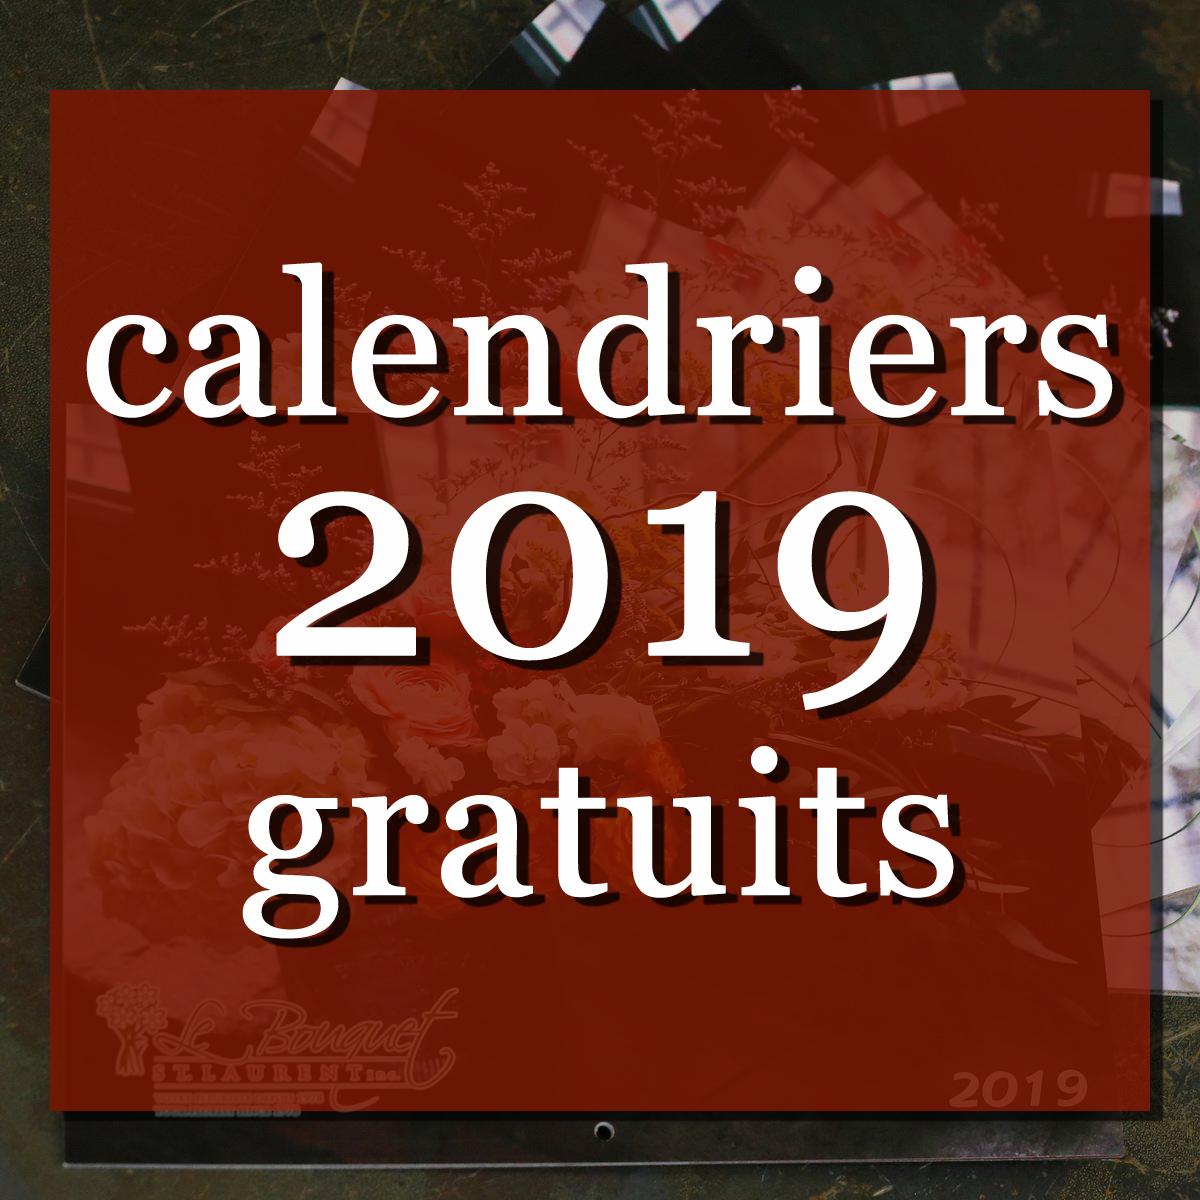 Calendriers 2019 Gratuits